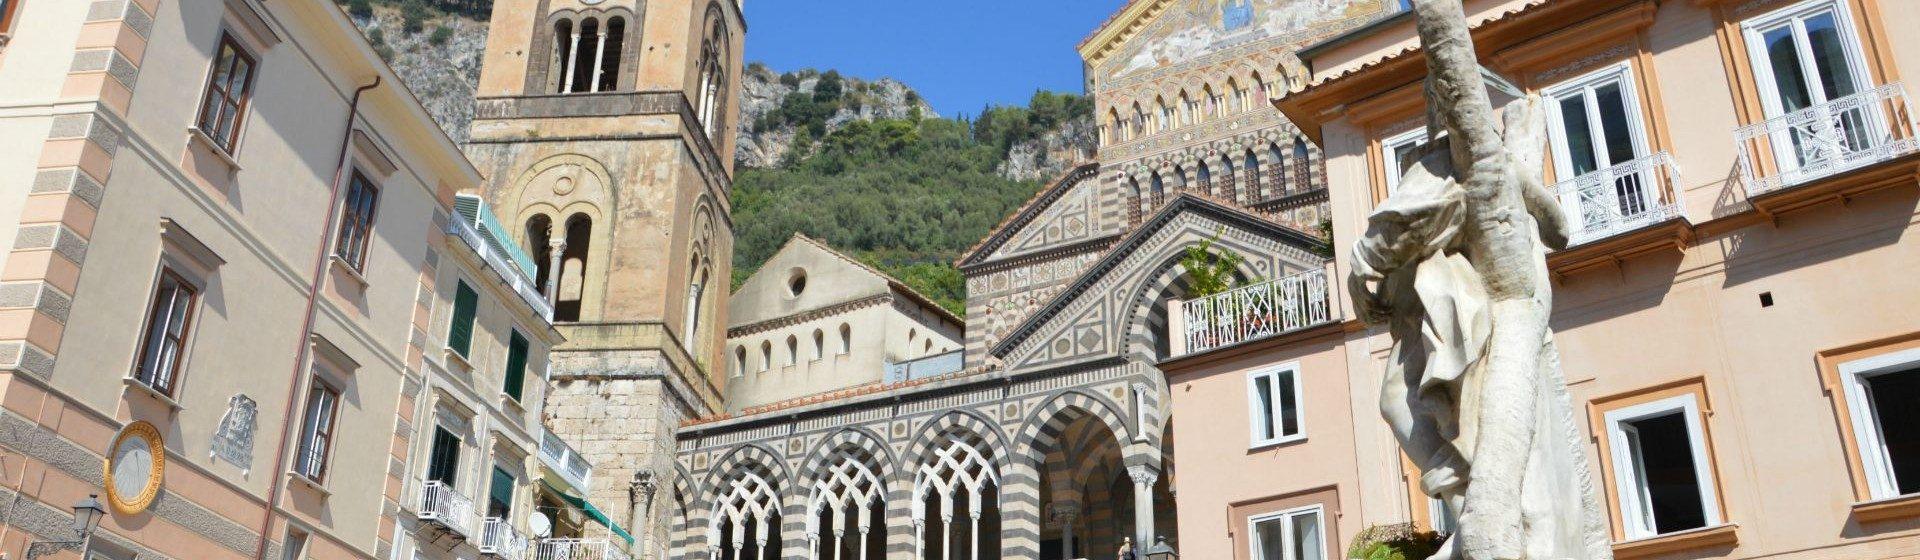 Drivinaples Amalfi Coast  Tour Shore Excurision